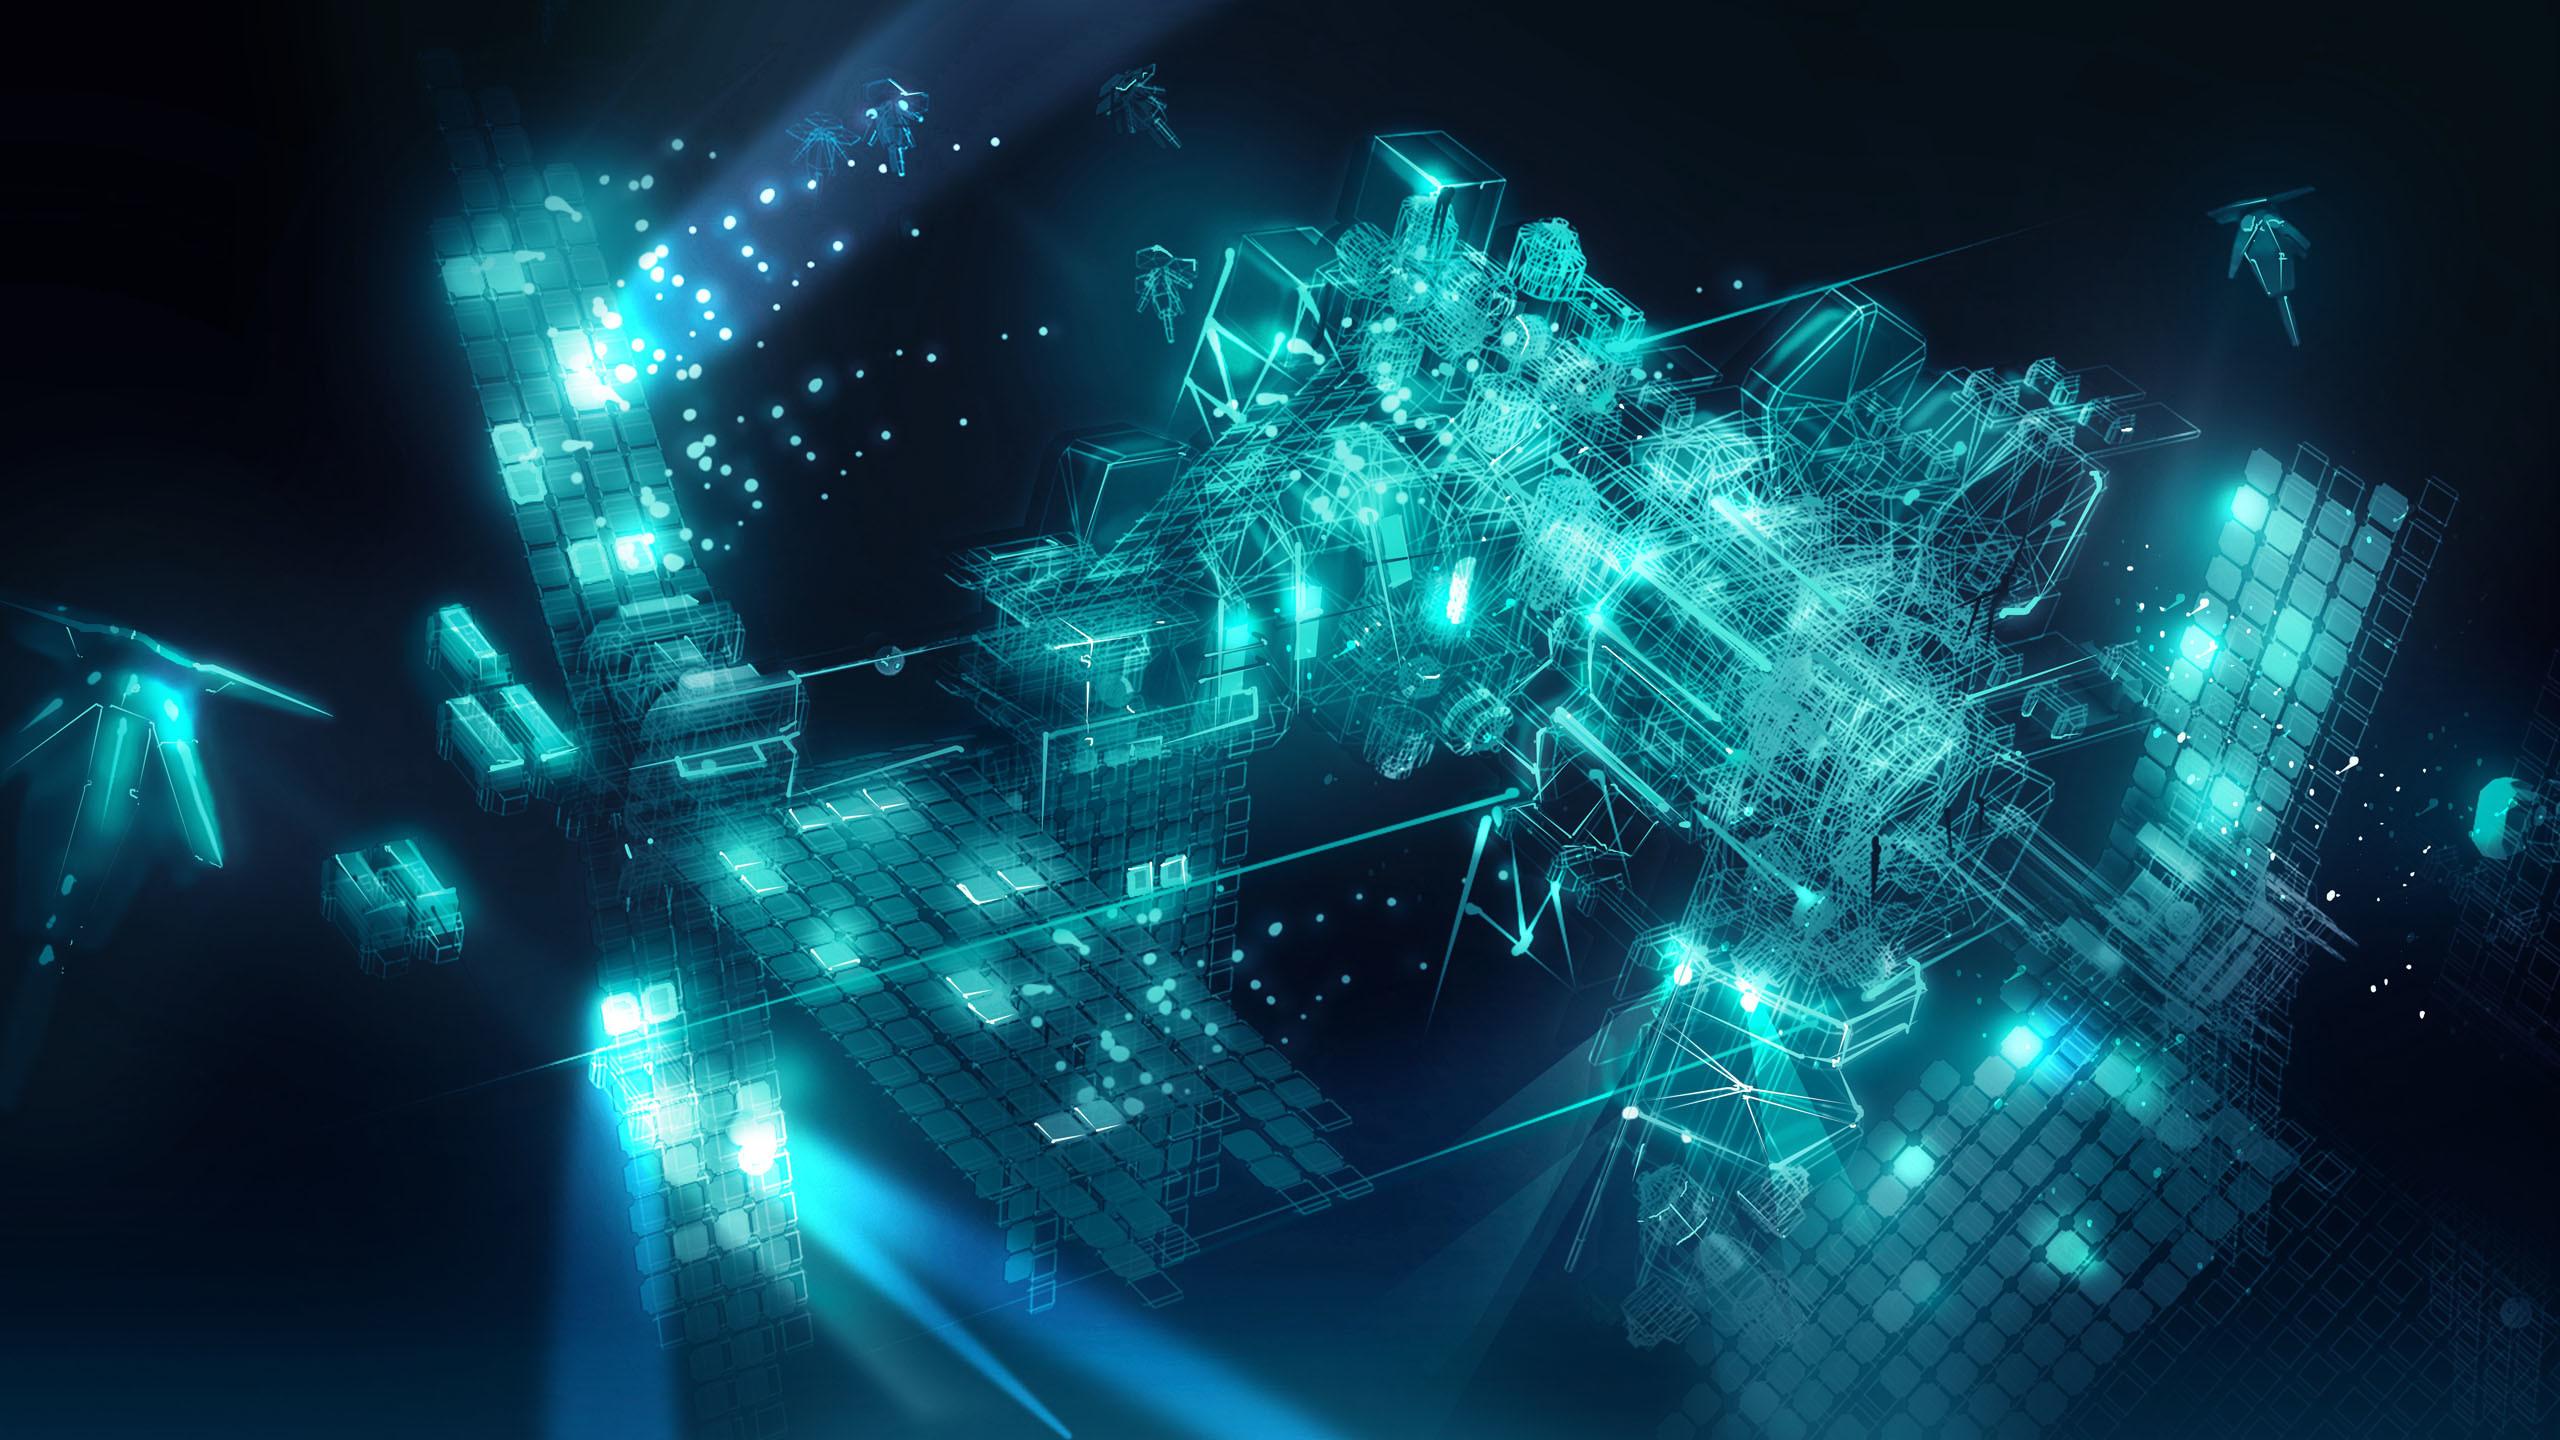 2560x1440 Engine 3d Live Wallpaper Artificial Intelligence Wallpaper 4k 2560x1440 Wallpaper Teahub Io